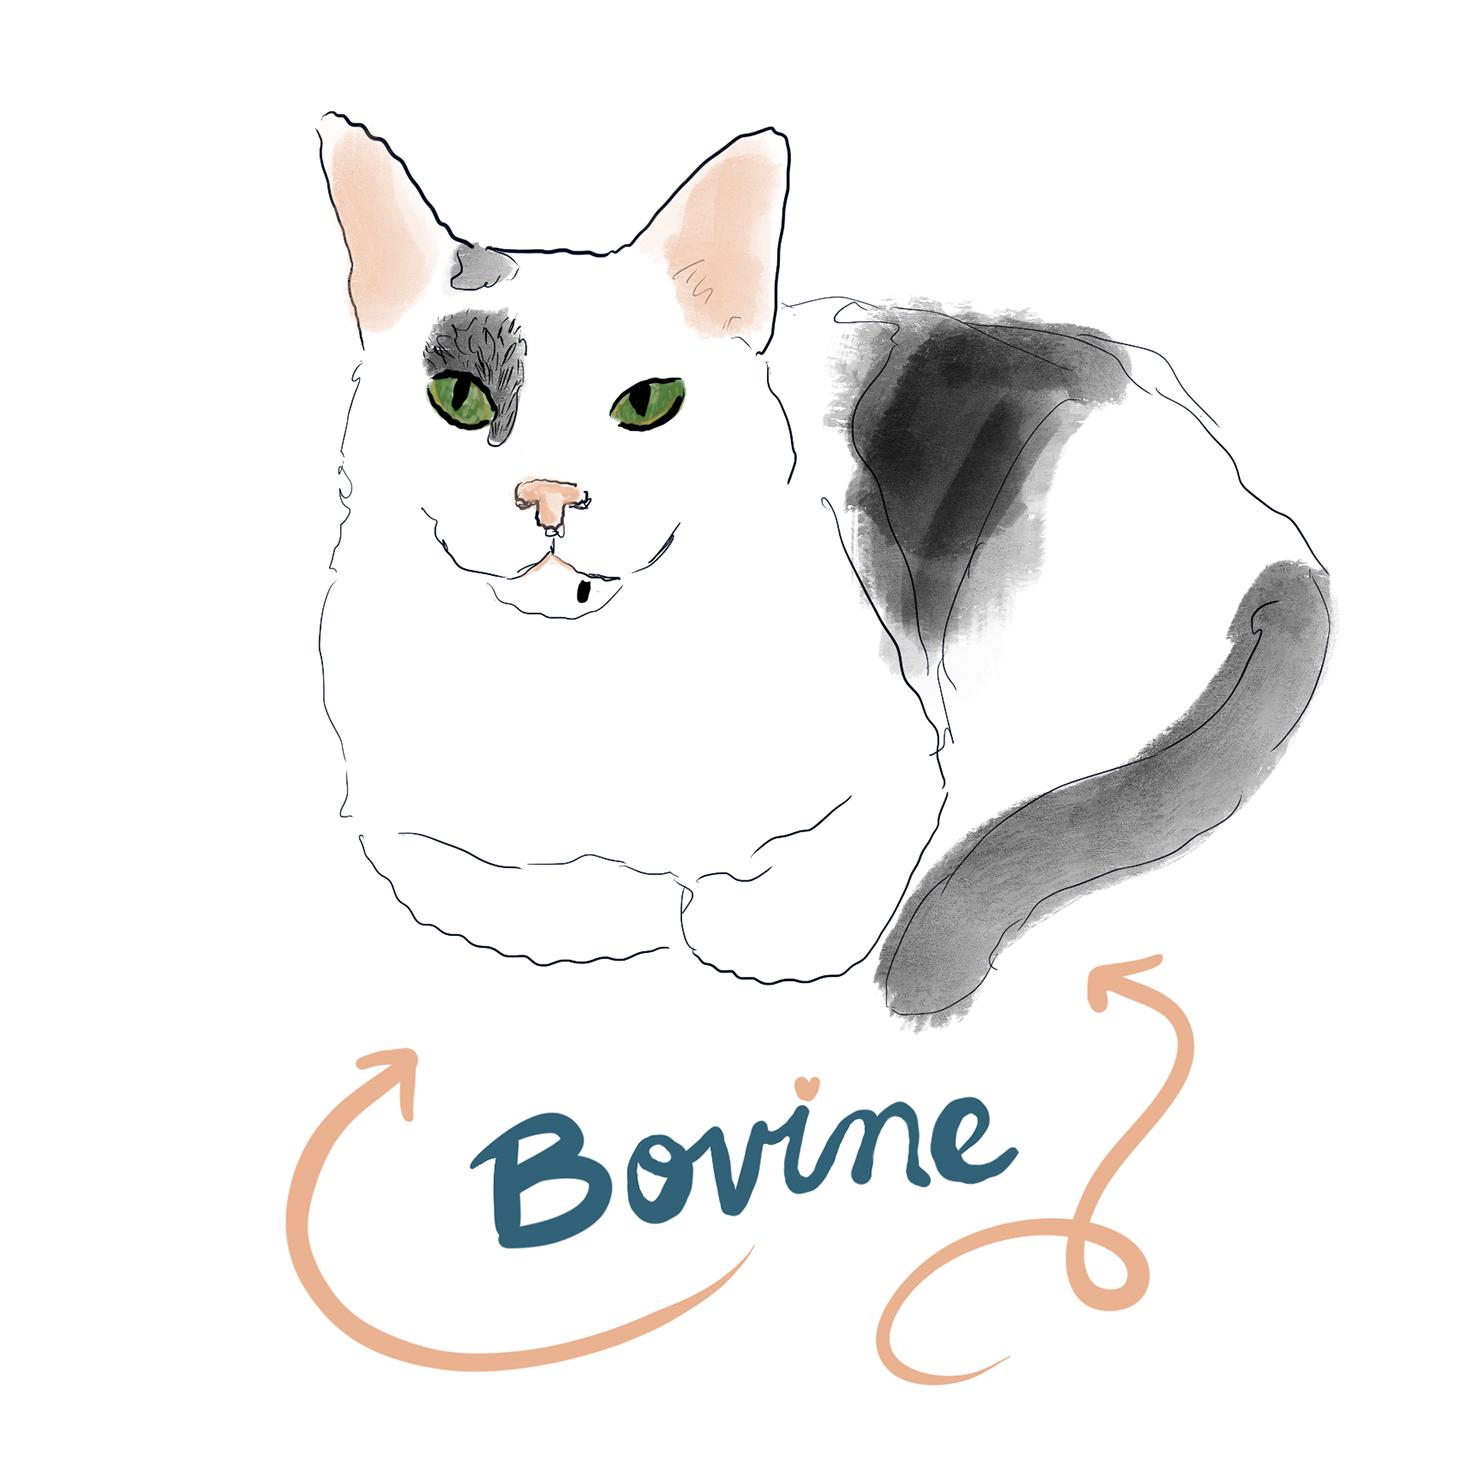 Bovine is 4 years old.